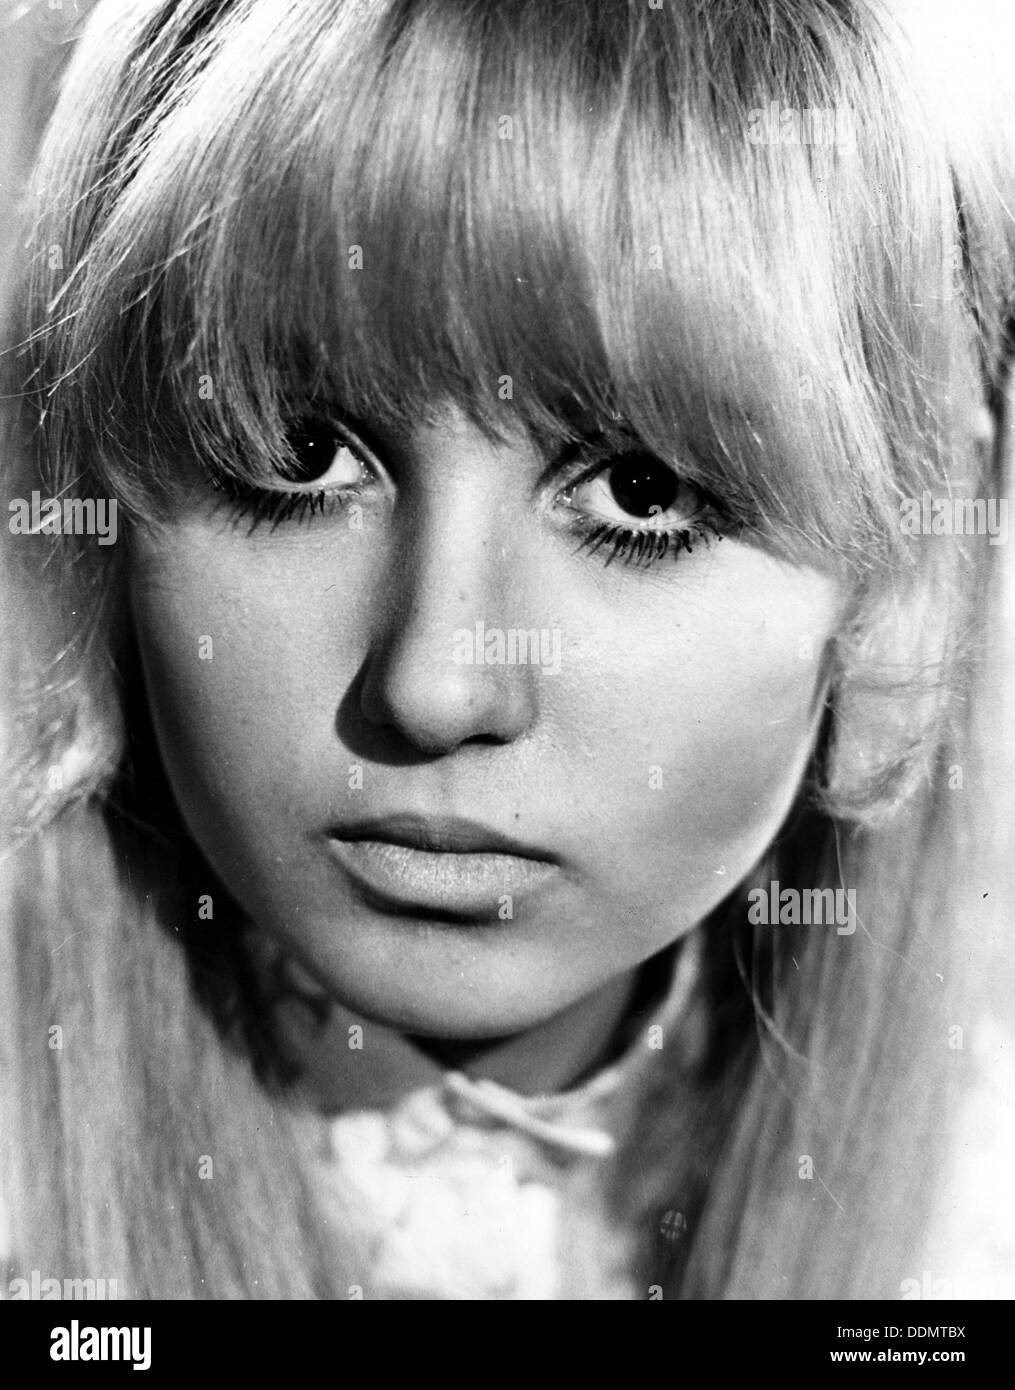 Adrienne Posta (1948- ), American actress, 1971. - Stock Image